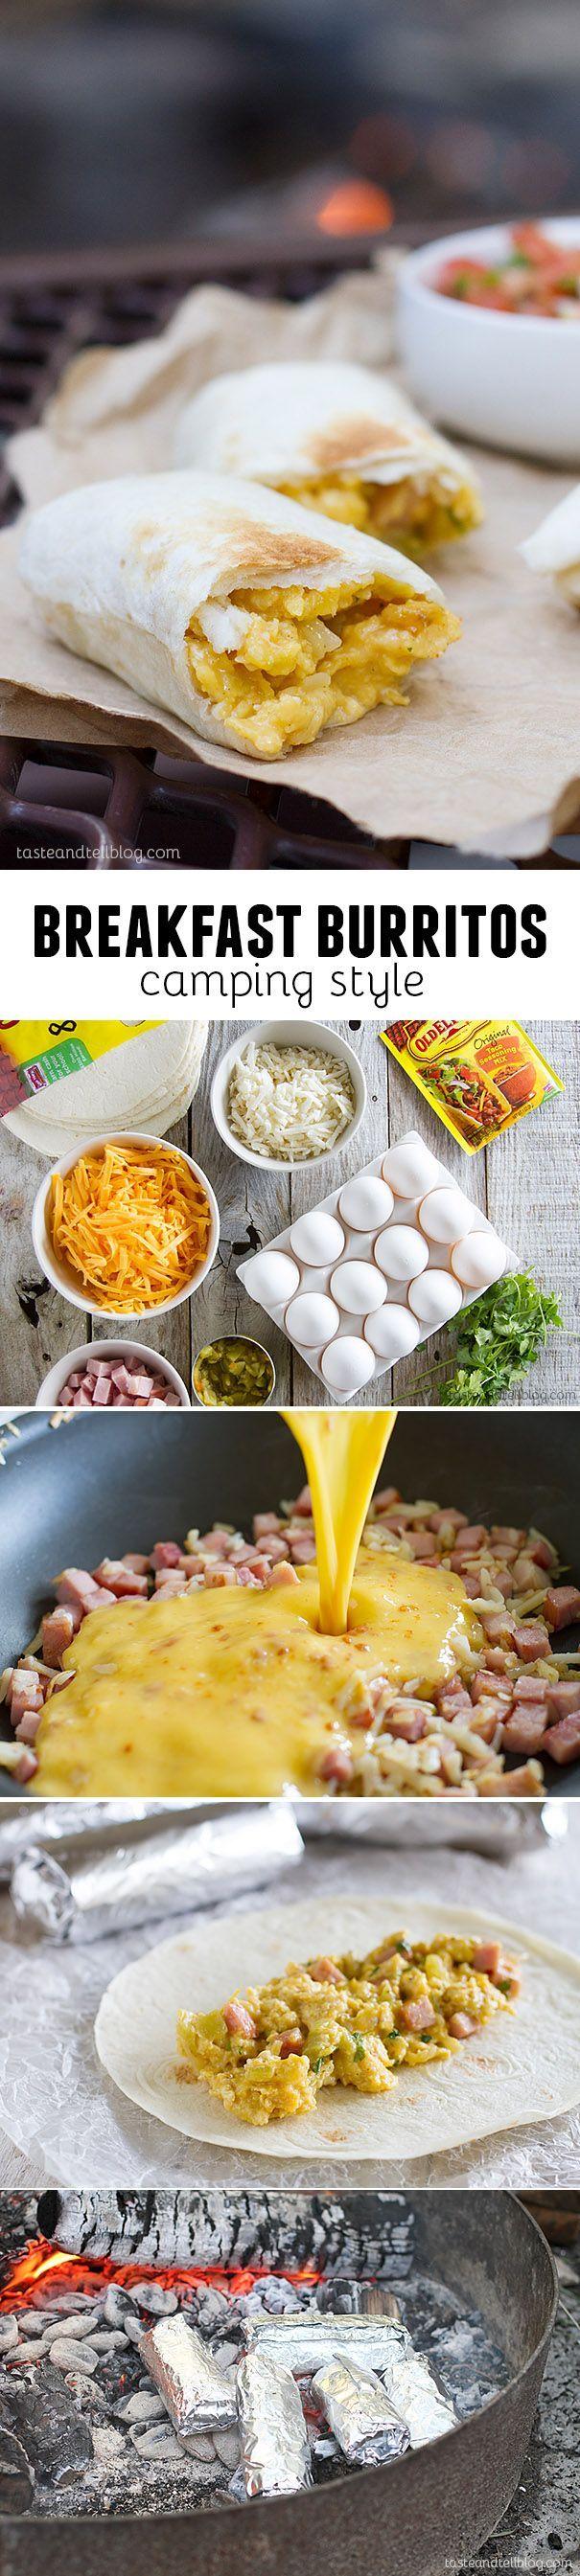 Breakfast Burritos - Campfire Style : Make ahead breakfast burritos perfect for campfire cooking!